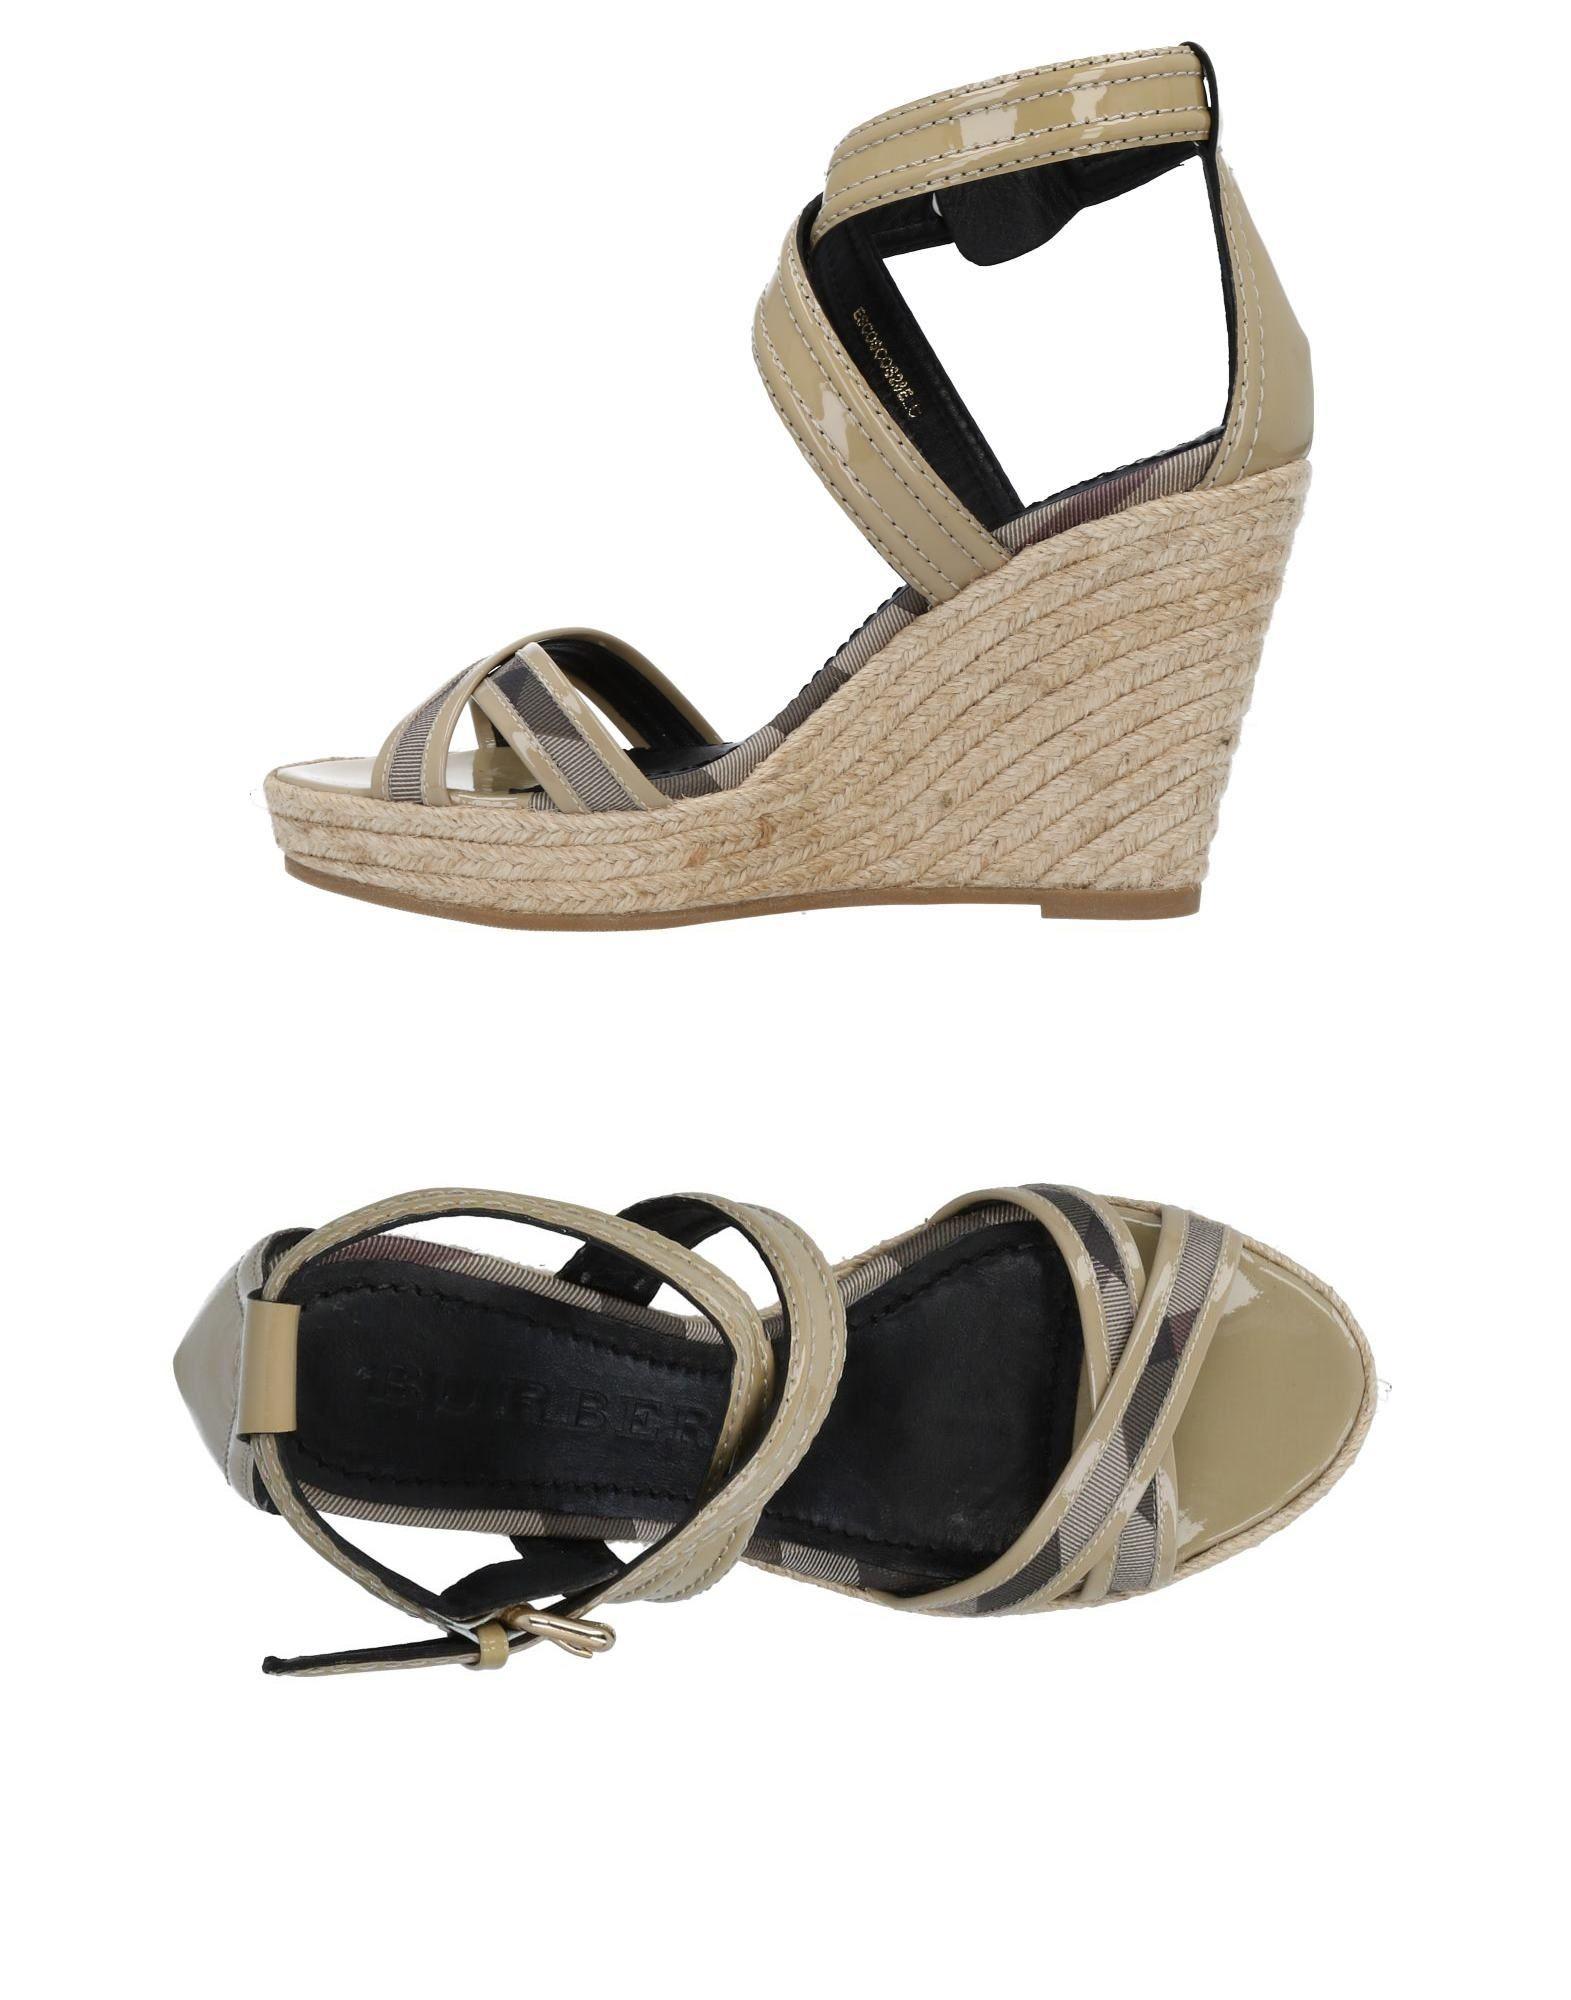 Burberry Sandalen Damen  11478309AIGut aussehende strapazierfähige Schuhe